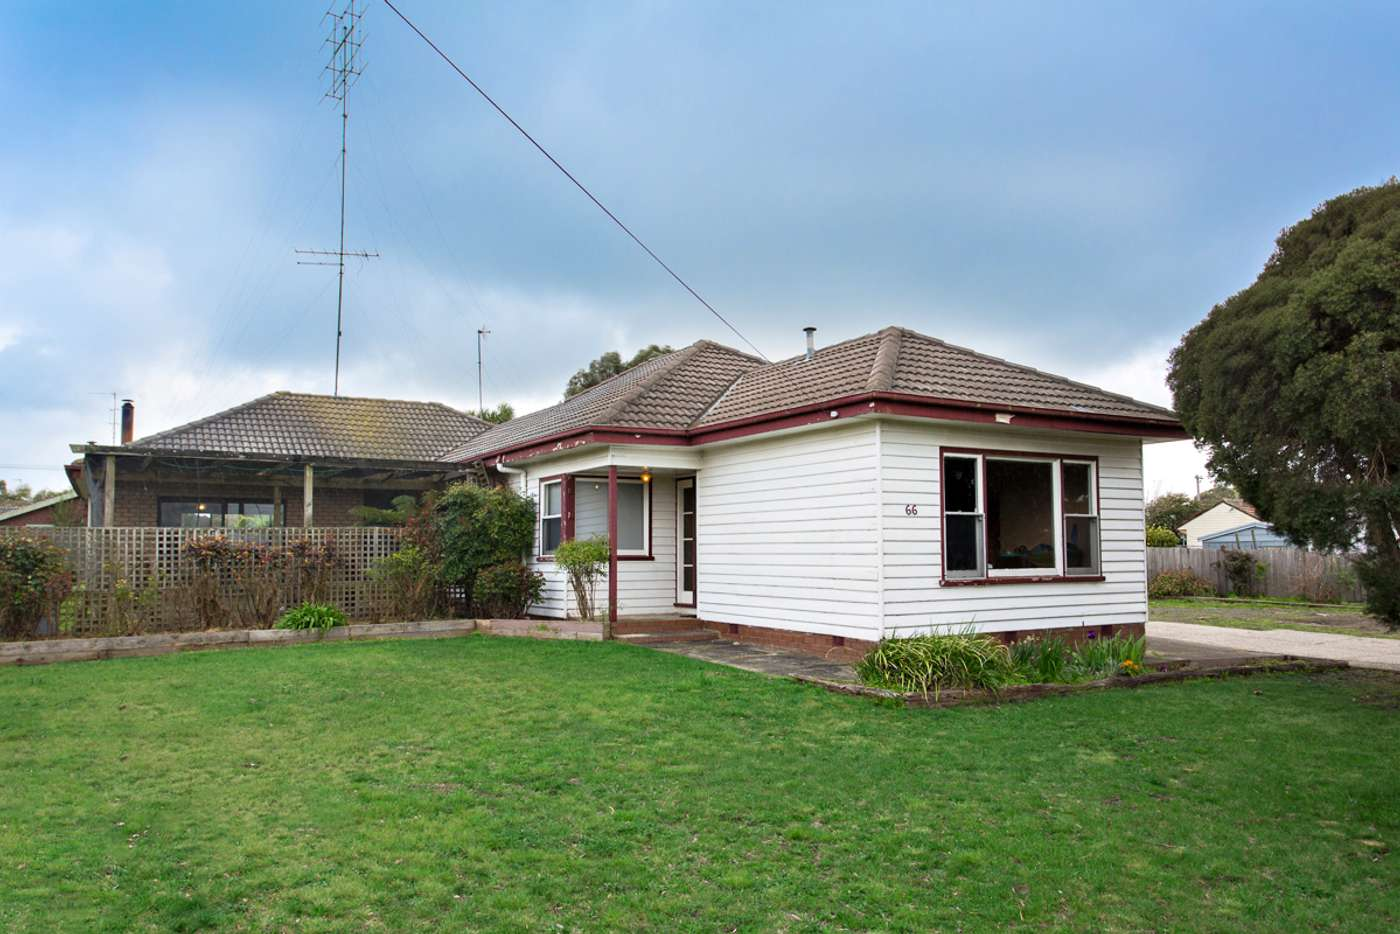 Main view of Homely house listing, 66 Victoria Street, Sebastopol VIC 3356